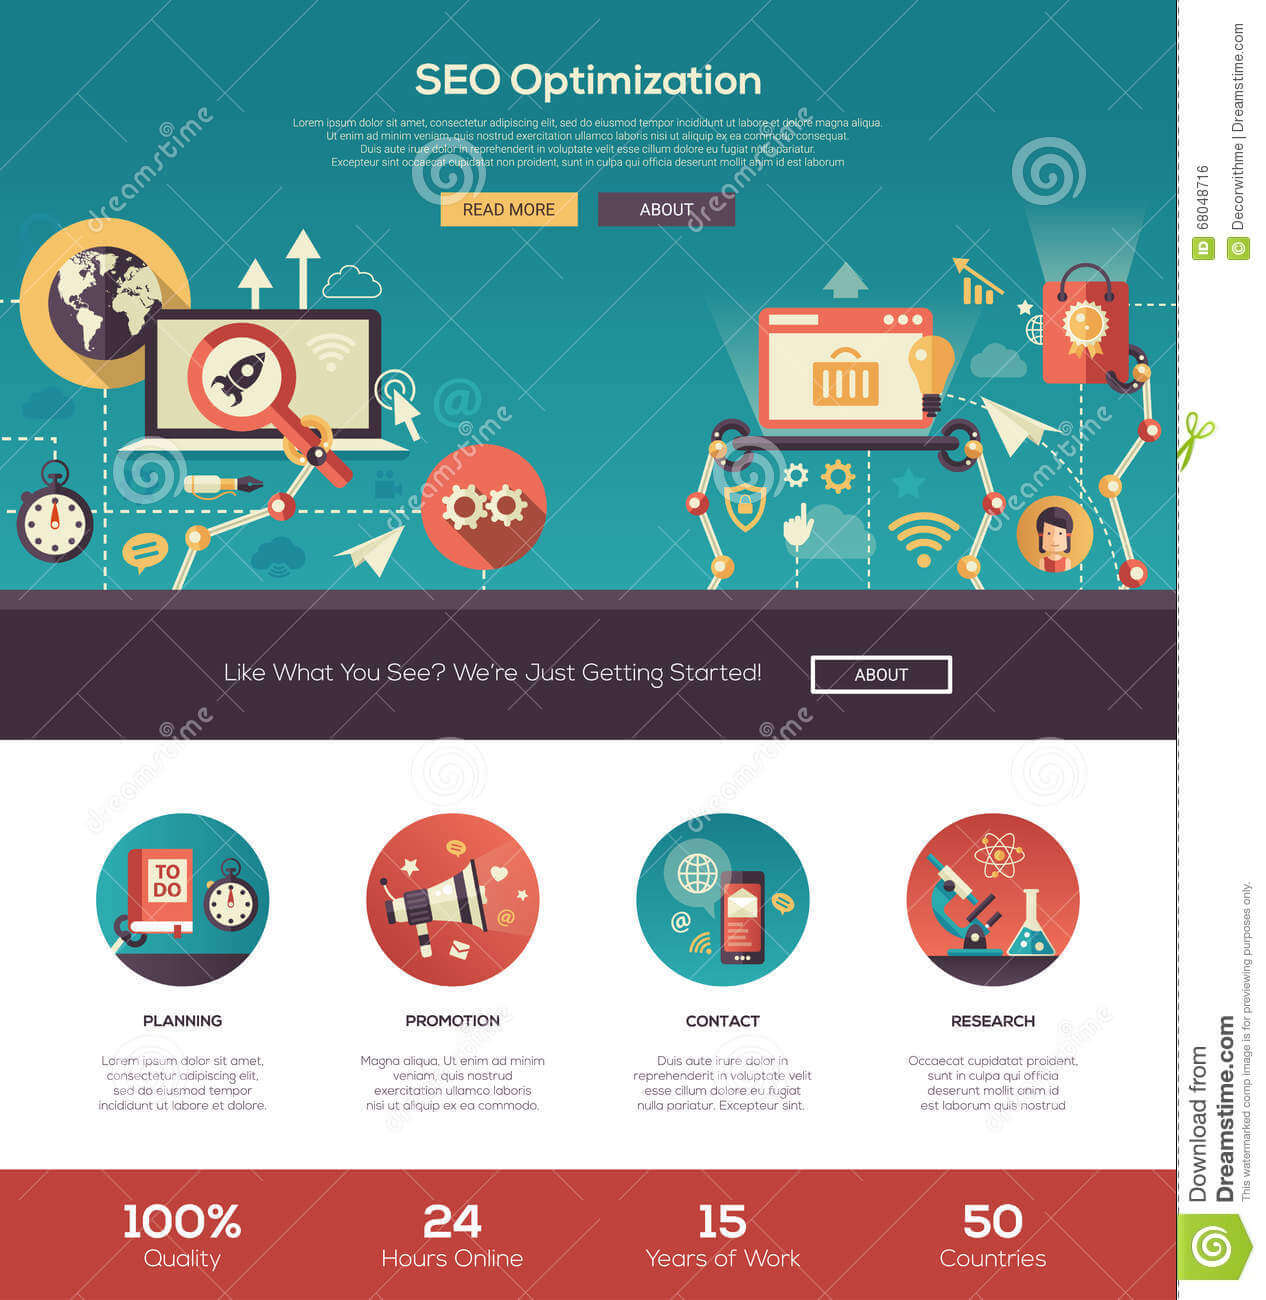 thiết kế website chuẩn SEO, bài viết chuẩn SEO, công ty thiết kế website chuyên nghiệp,thiết kế website chuyên nghiệp